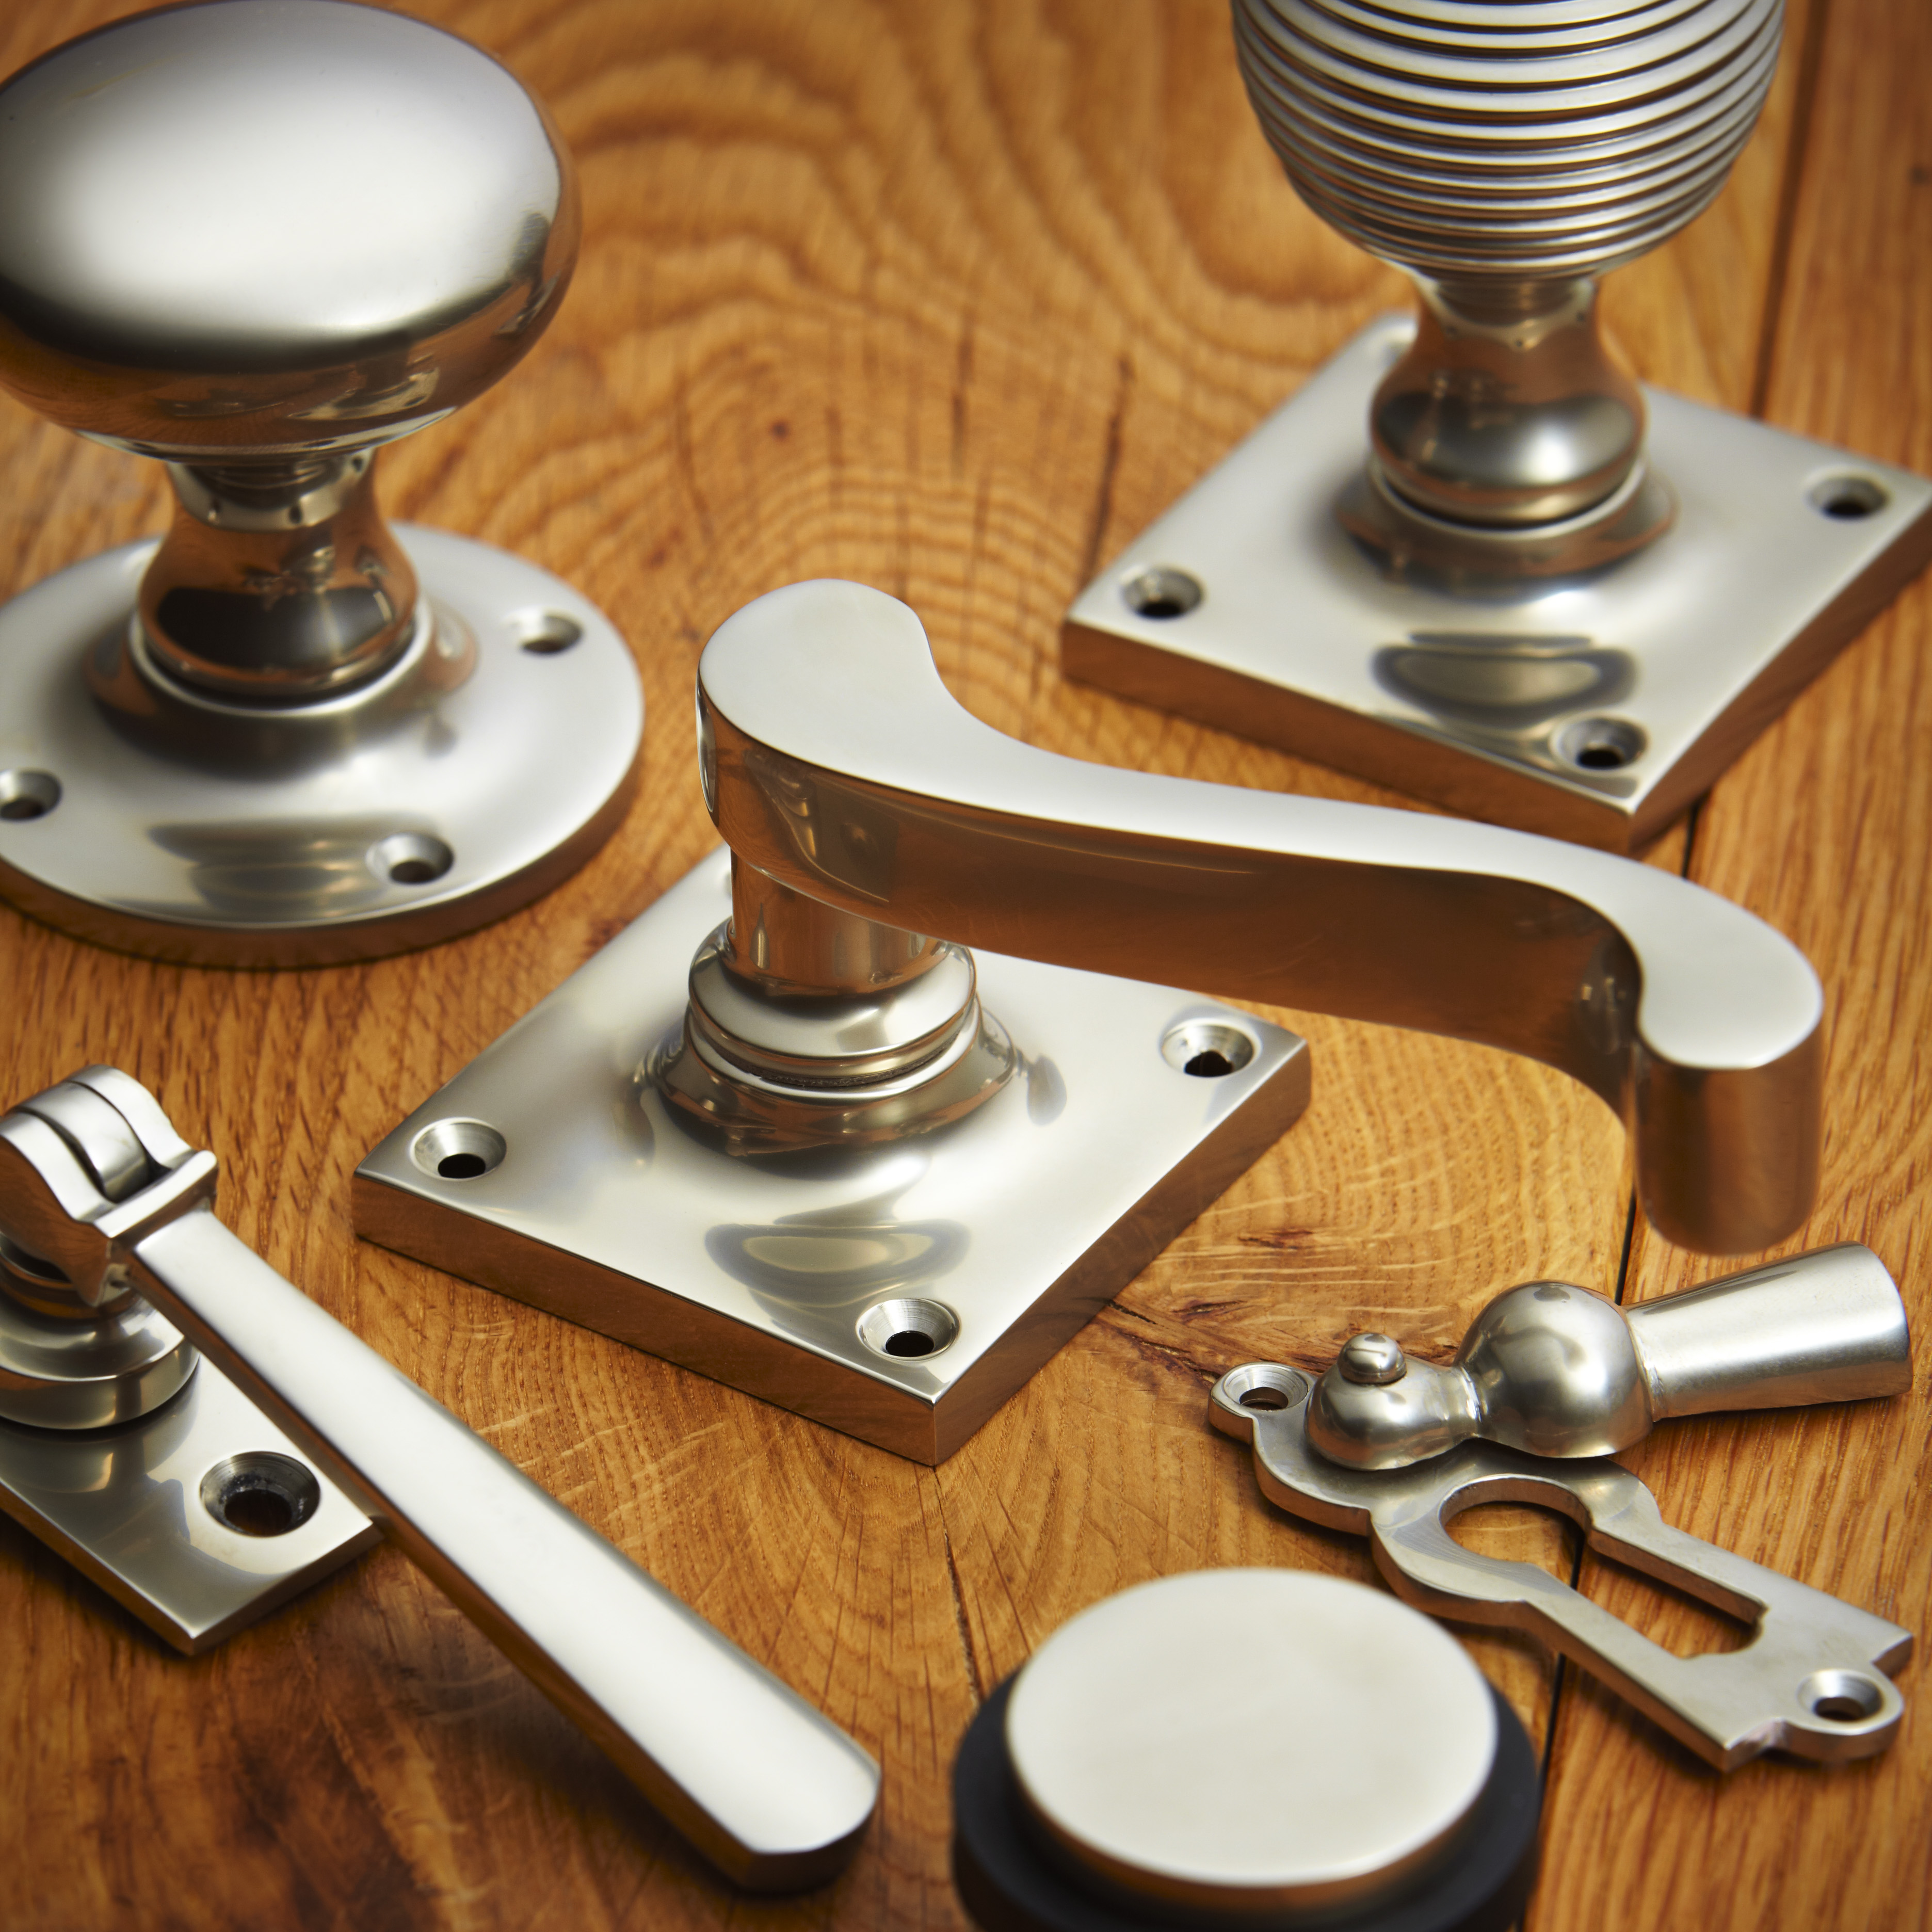 croft hardware pearl nickel